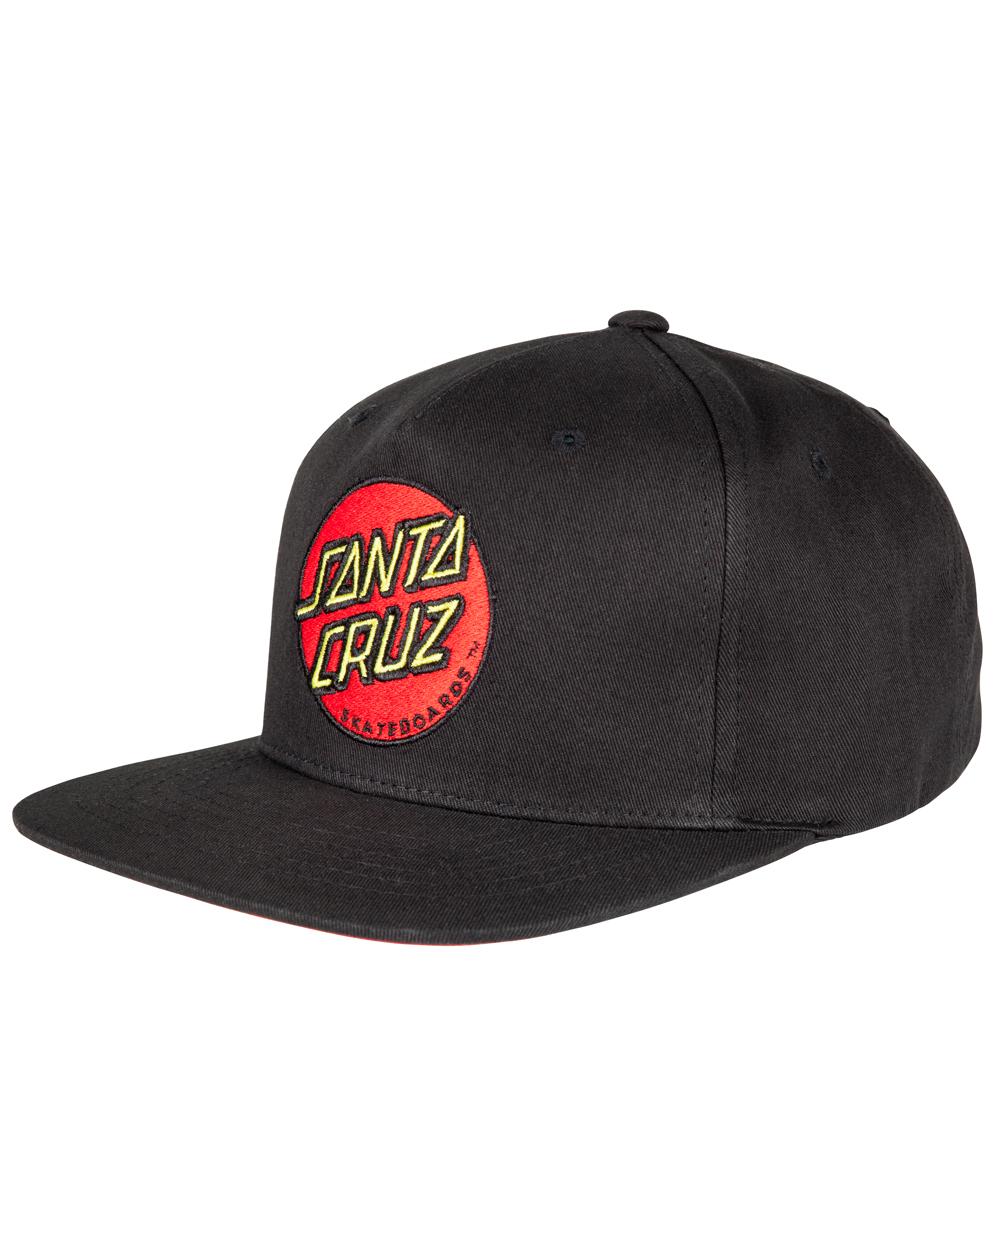 Santa Cruz Men's Baseball Cap Classic Dot Black